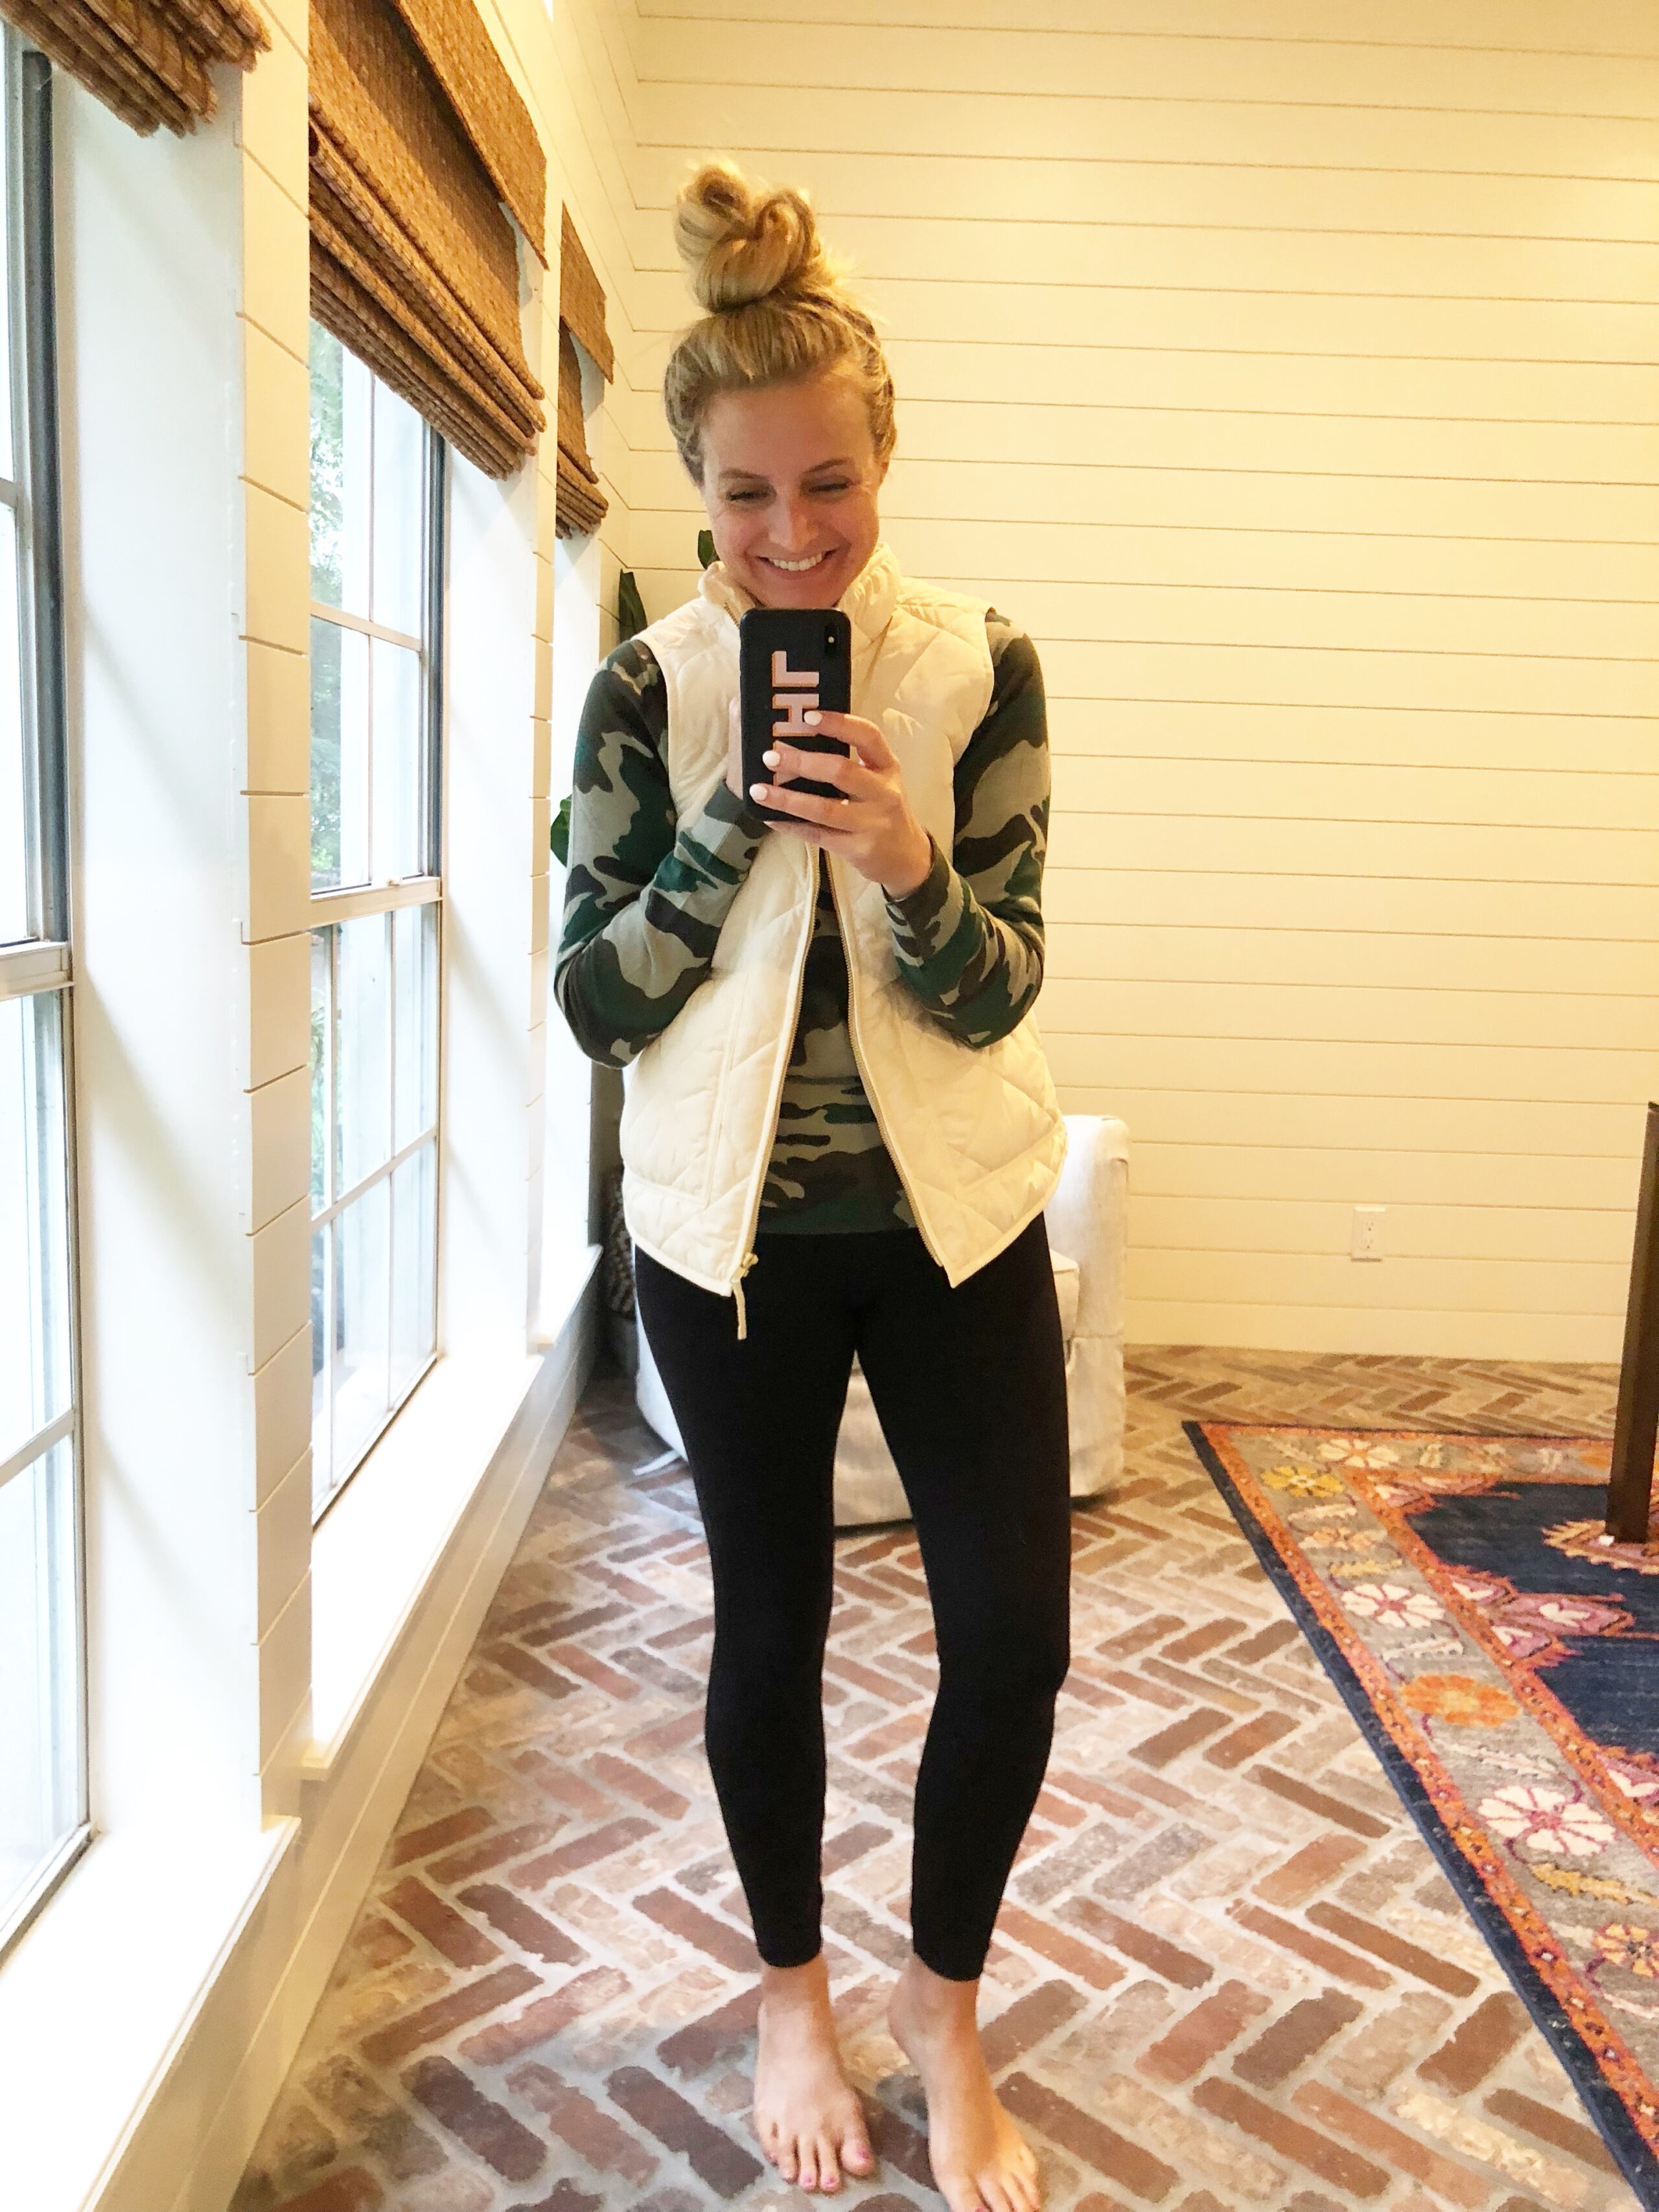 J Crew Favorites on Amazon, featured by popular Houston fashion blogger, Fancy Ashley: J Crew puffer vest